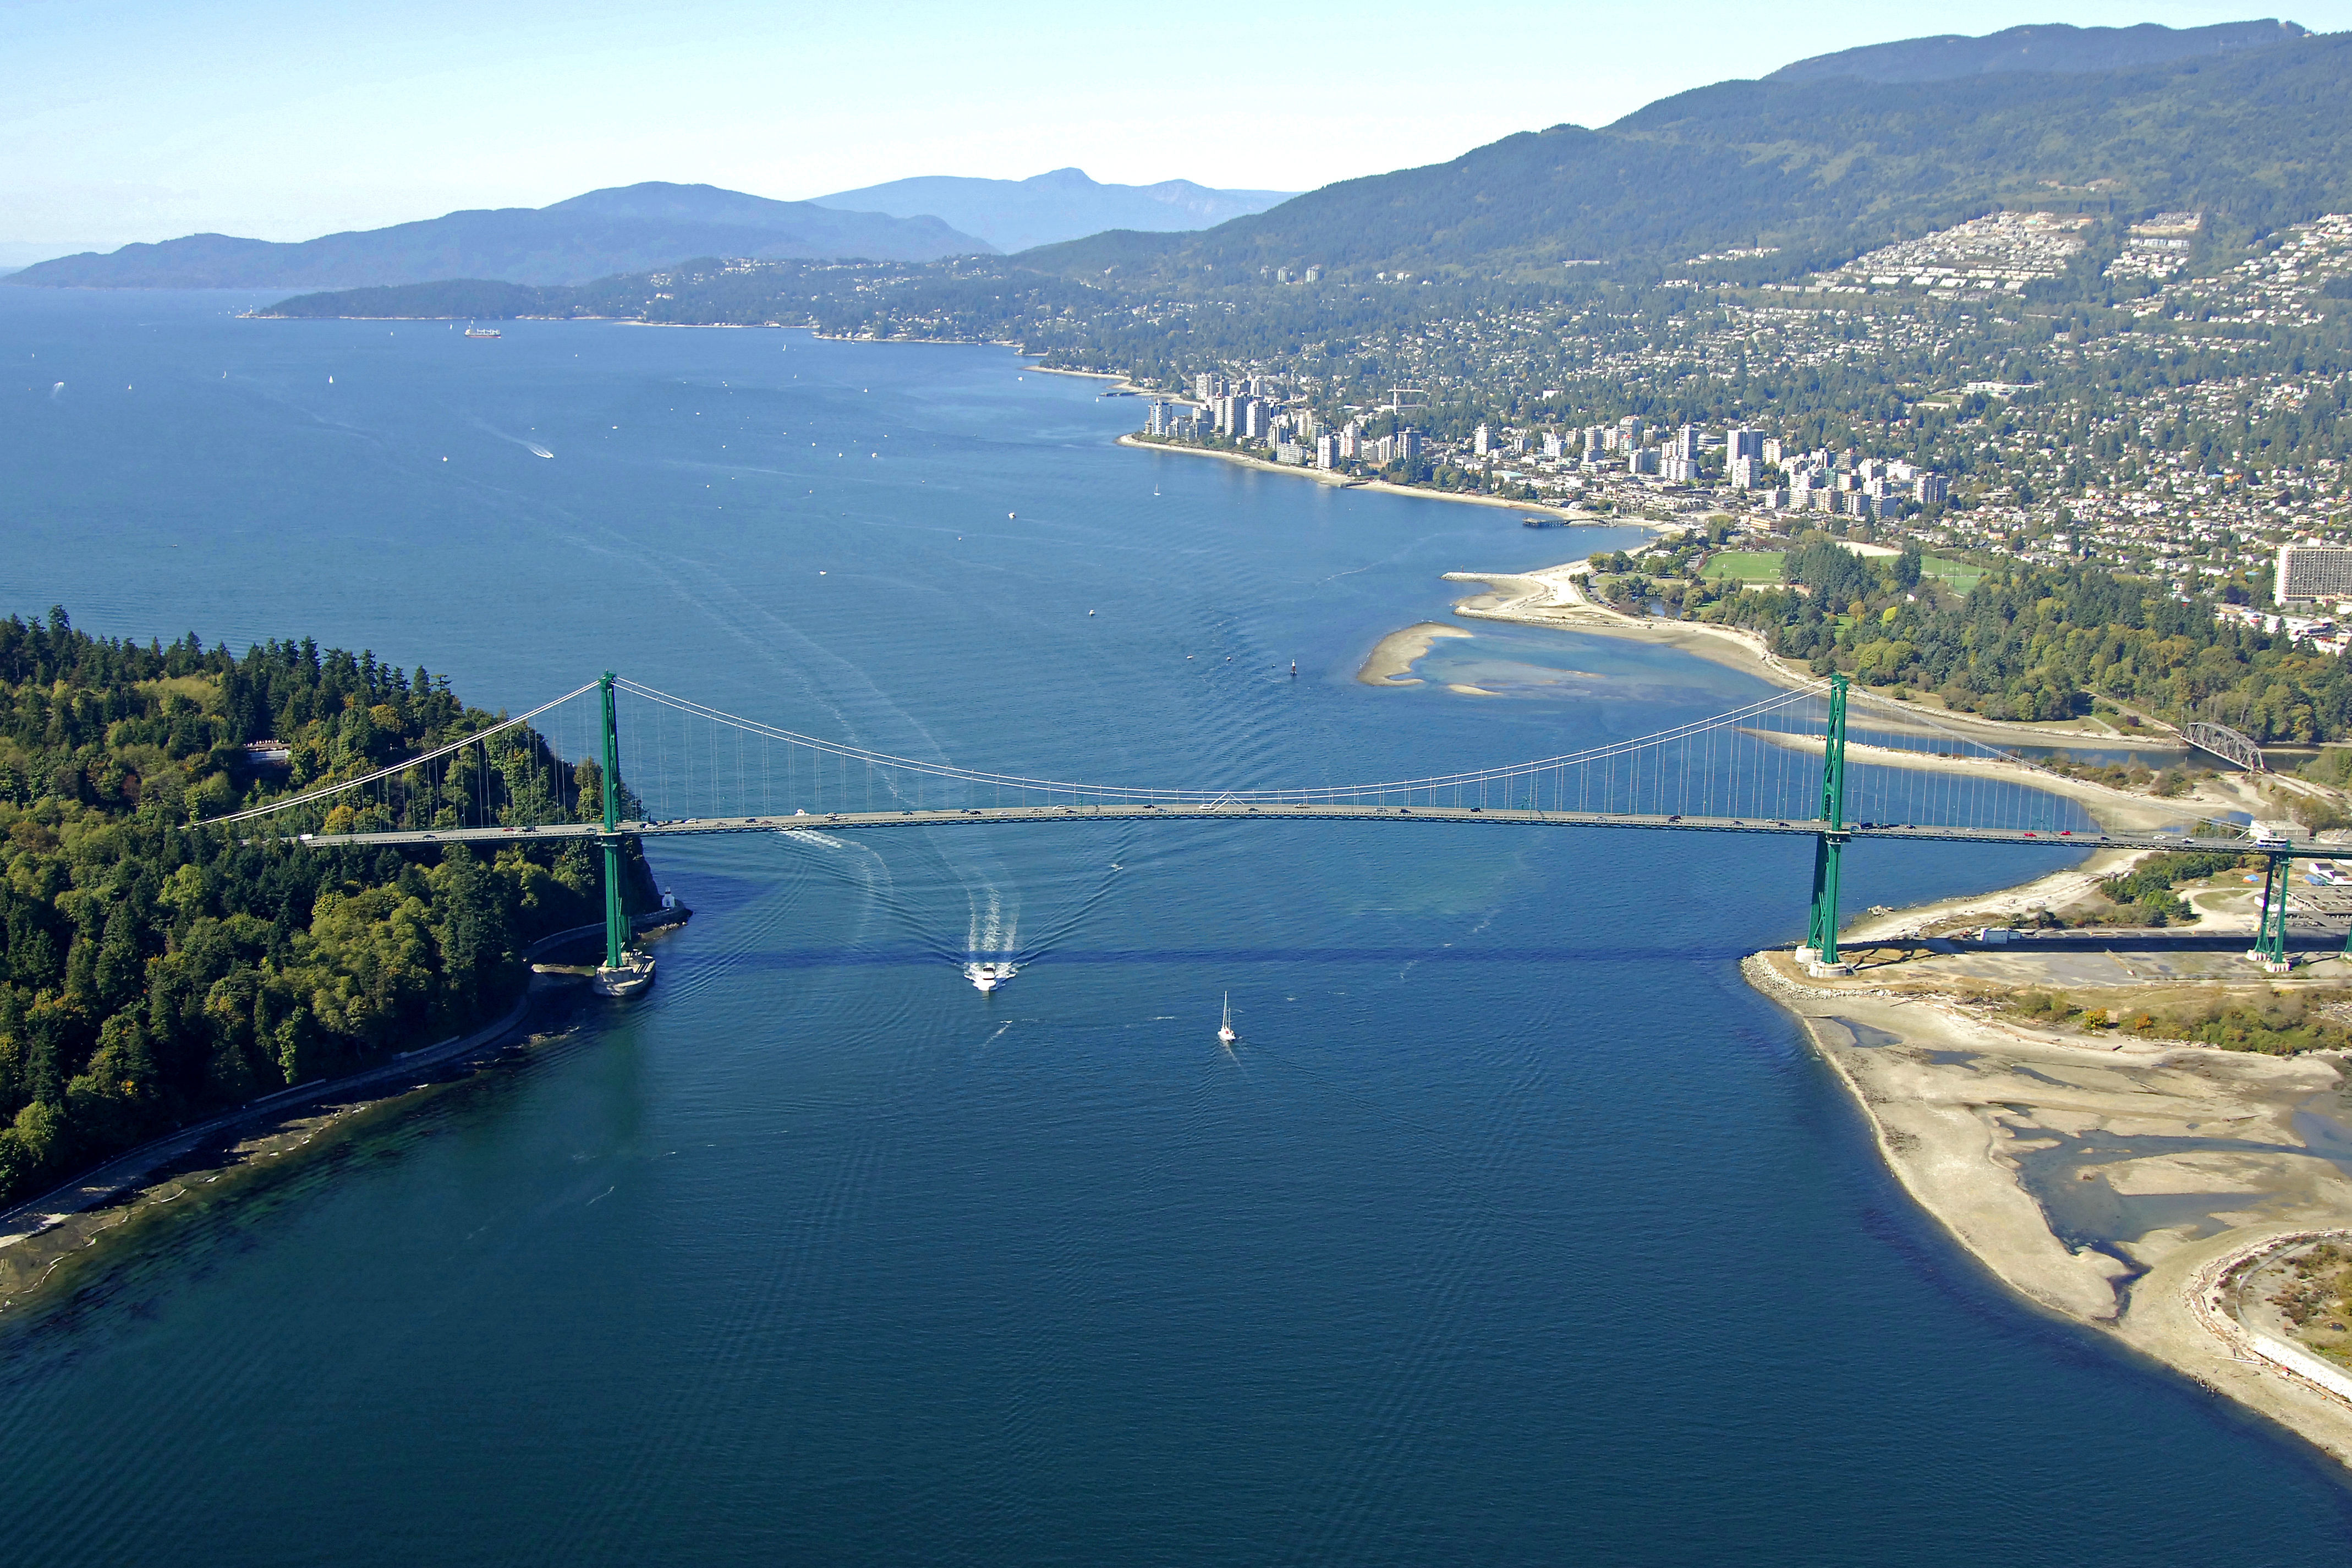 Lions Gate Bridge Landmark in Vancouver, BC, Canada - landmark Reviews - Phone Number - Marinas.com